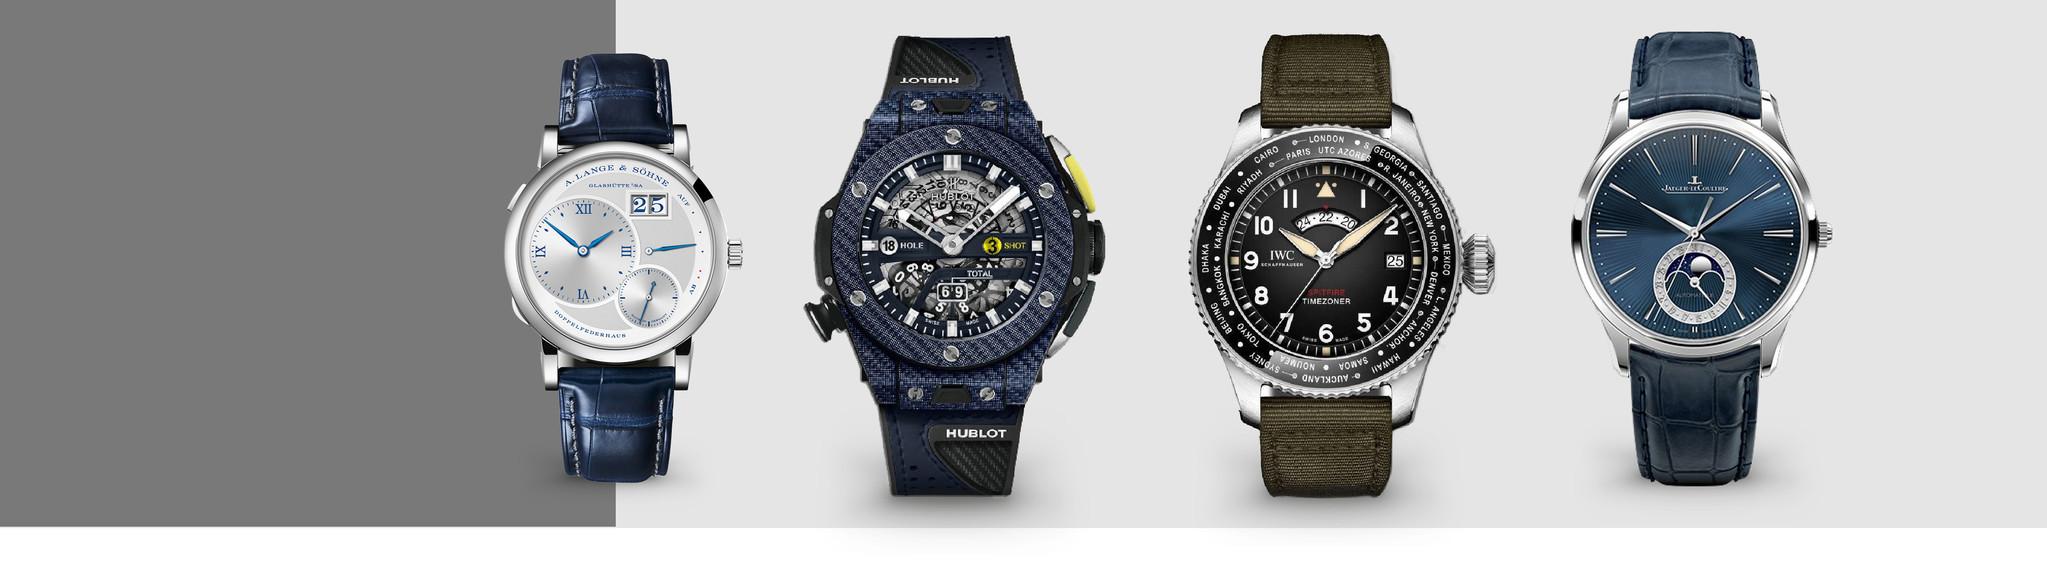 novelty watches | the newest watches at Schaap en Citroen jewellers